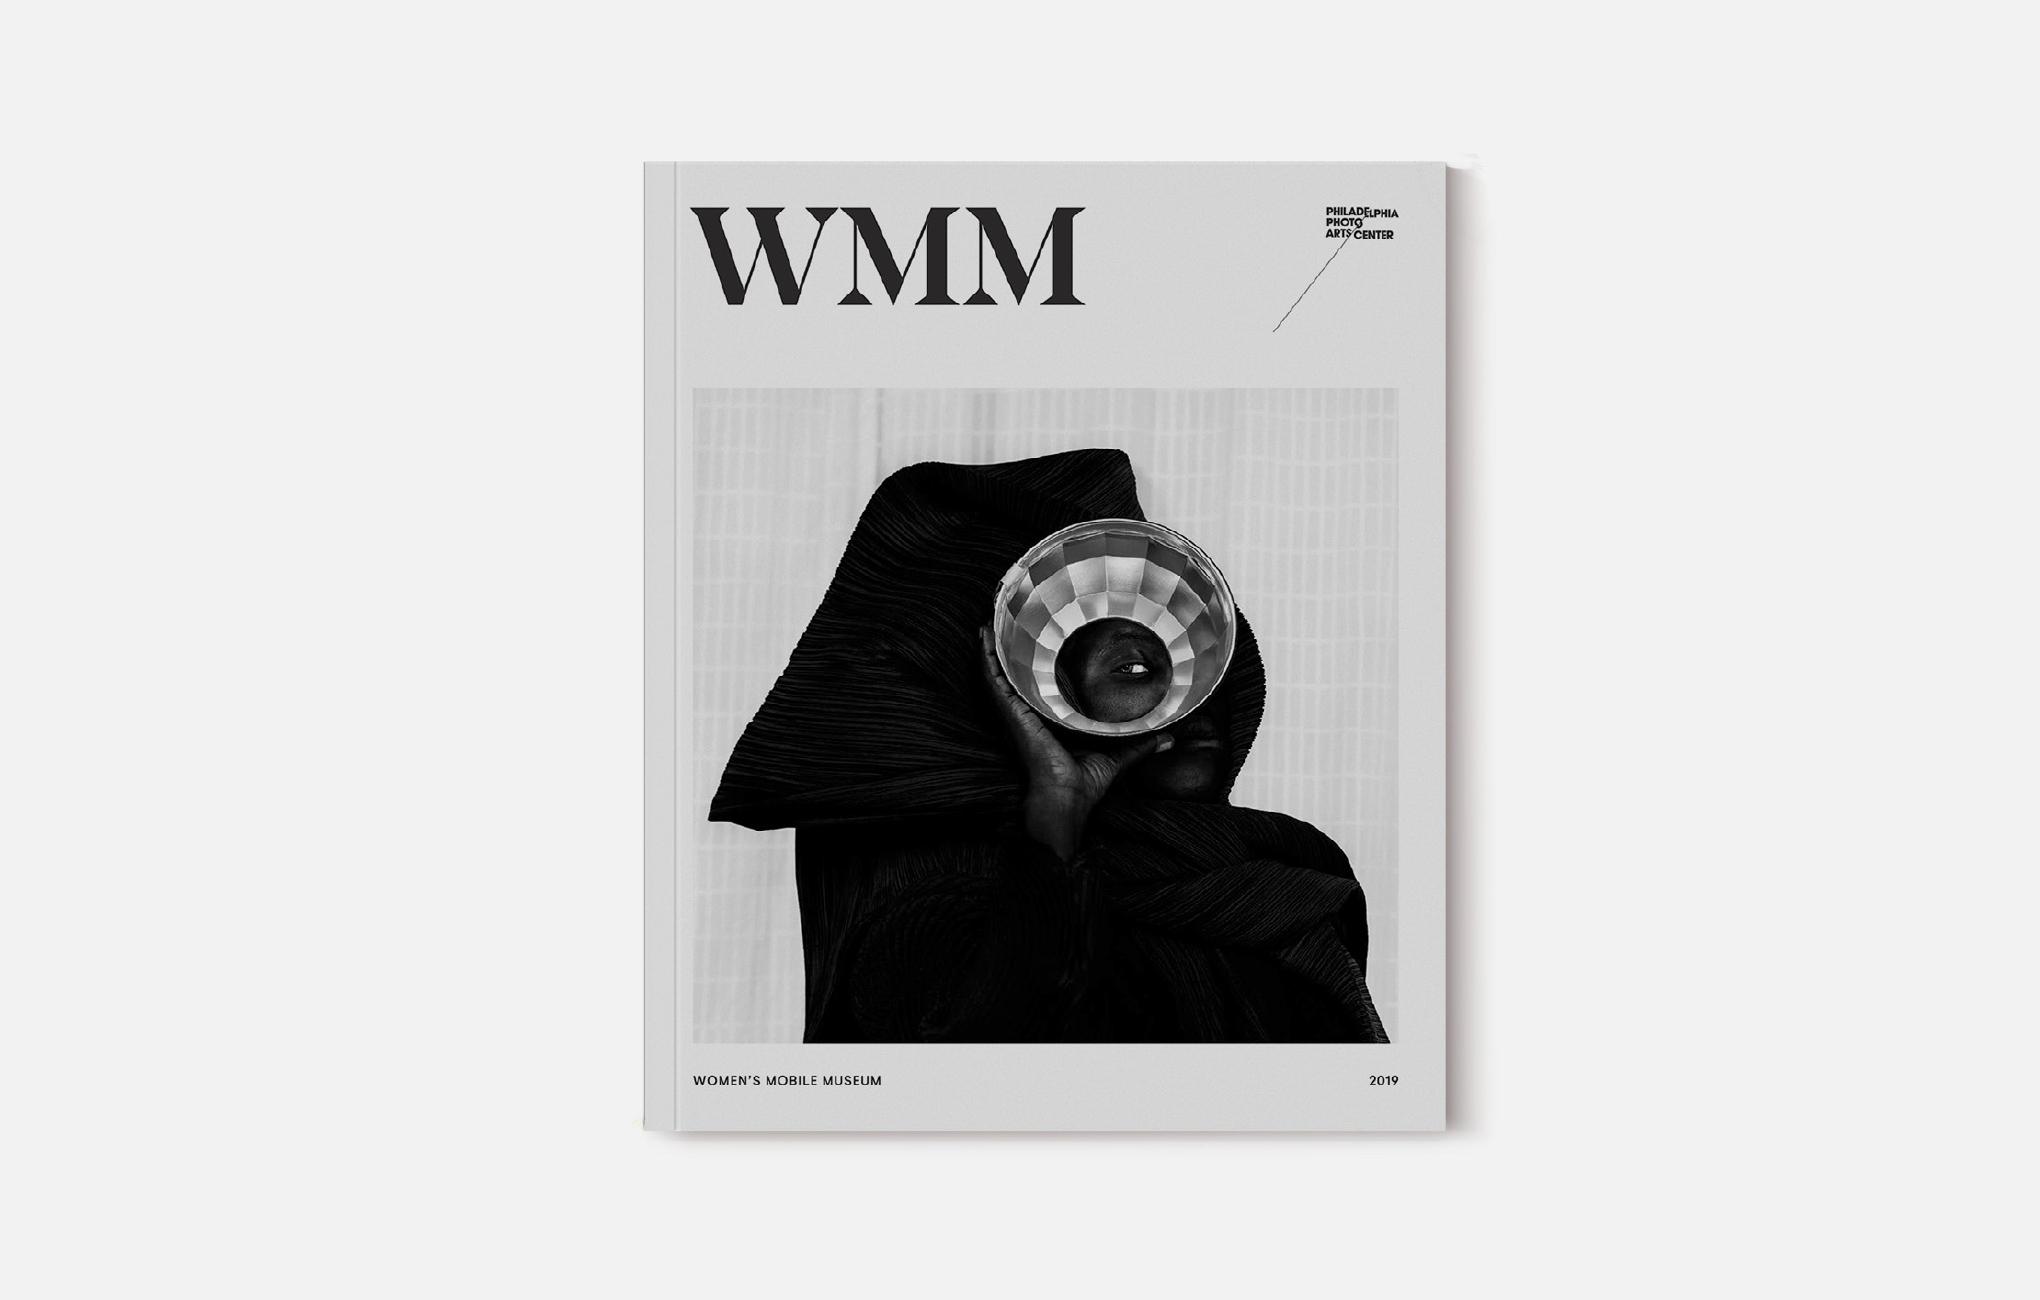 Women's Mobile Museum — Magazine